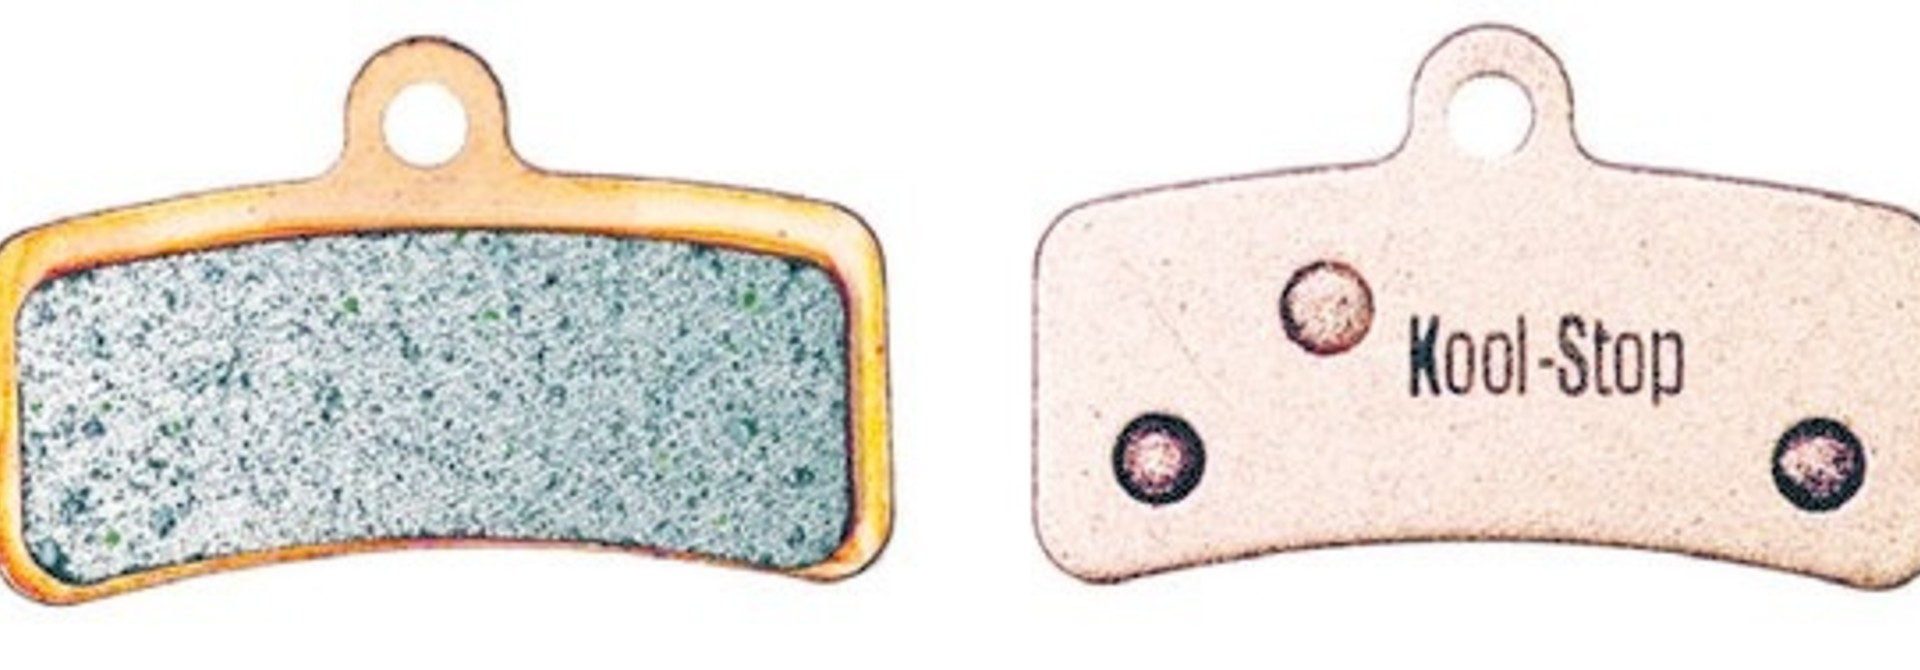 Kool-Stop Shimano Sintered M820/M640 Disc Brake Pads Copper Plate #KS-D640S